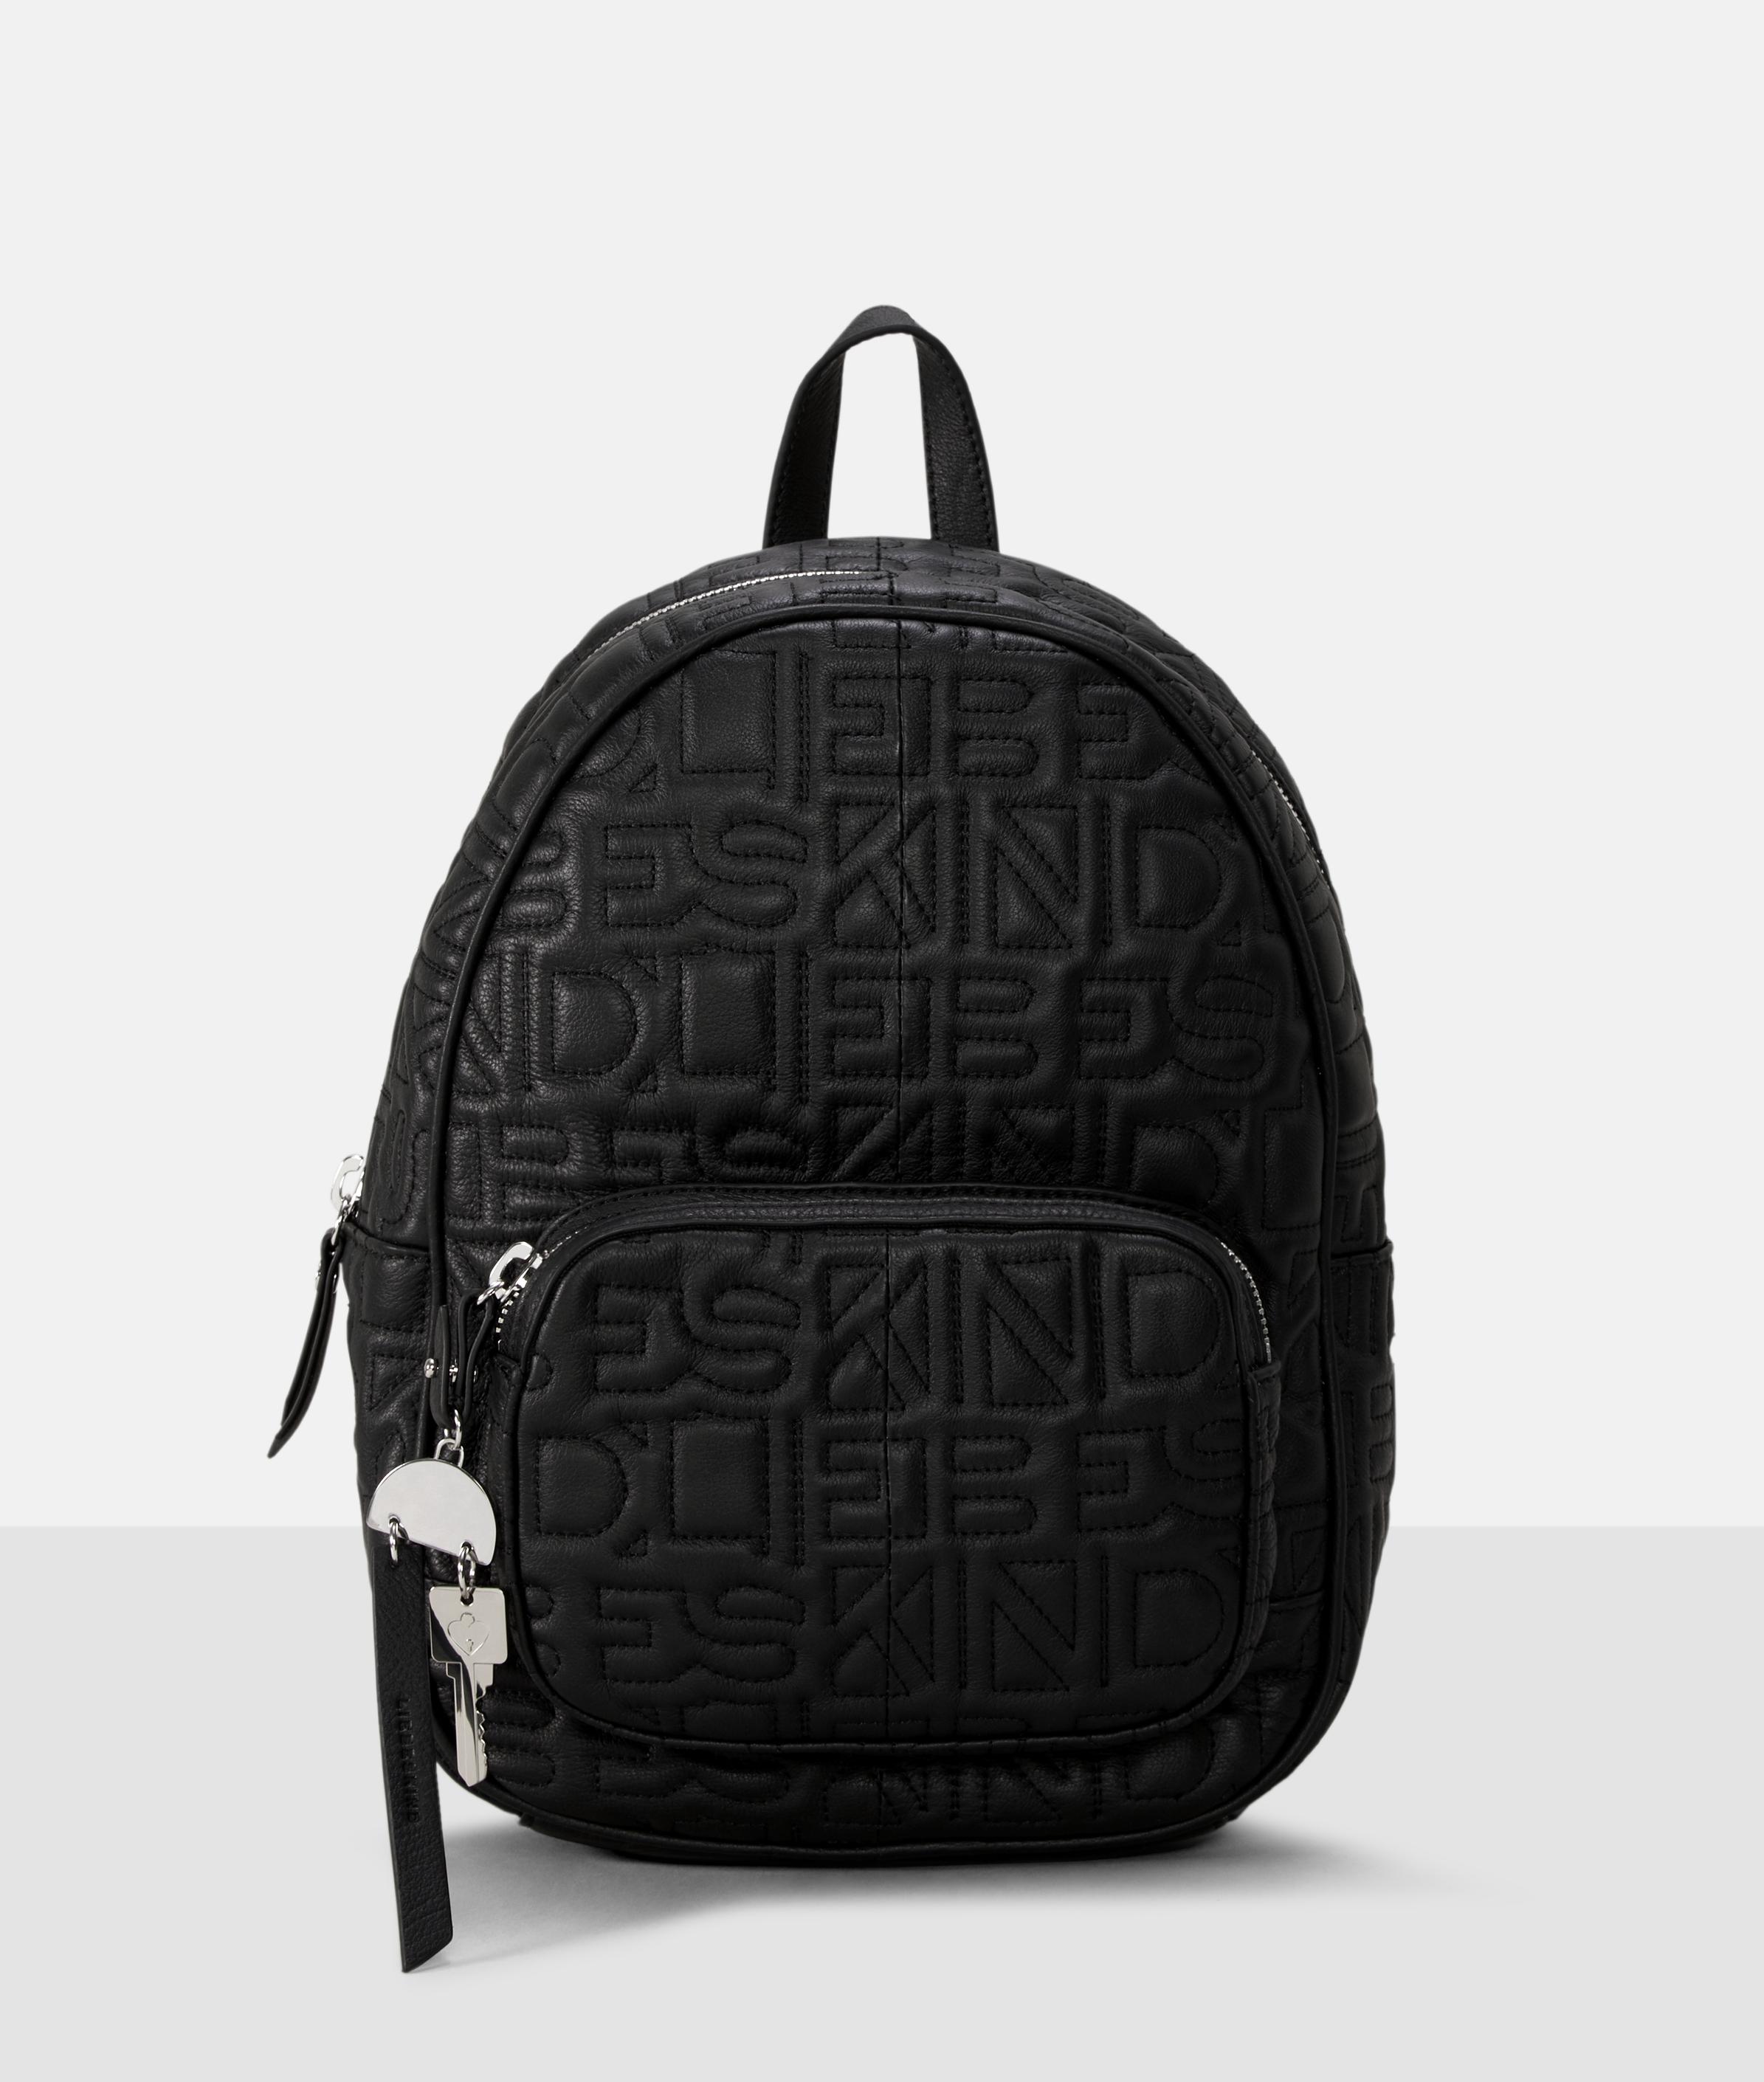 Berlin Tasche Urban Monogram Backpack M, Grau/Schwarz